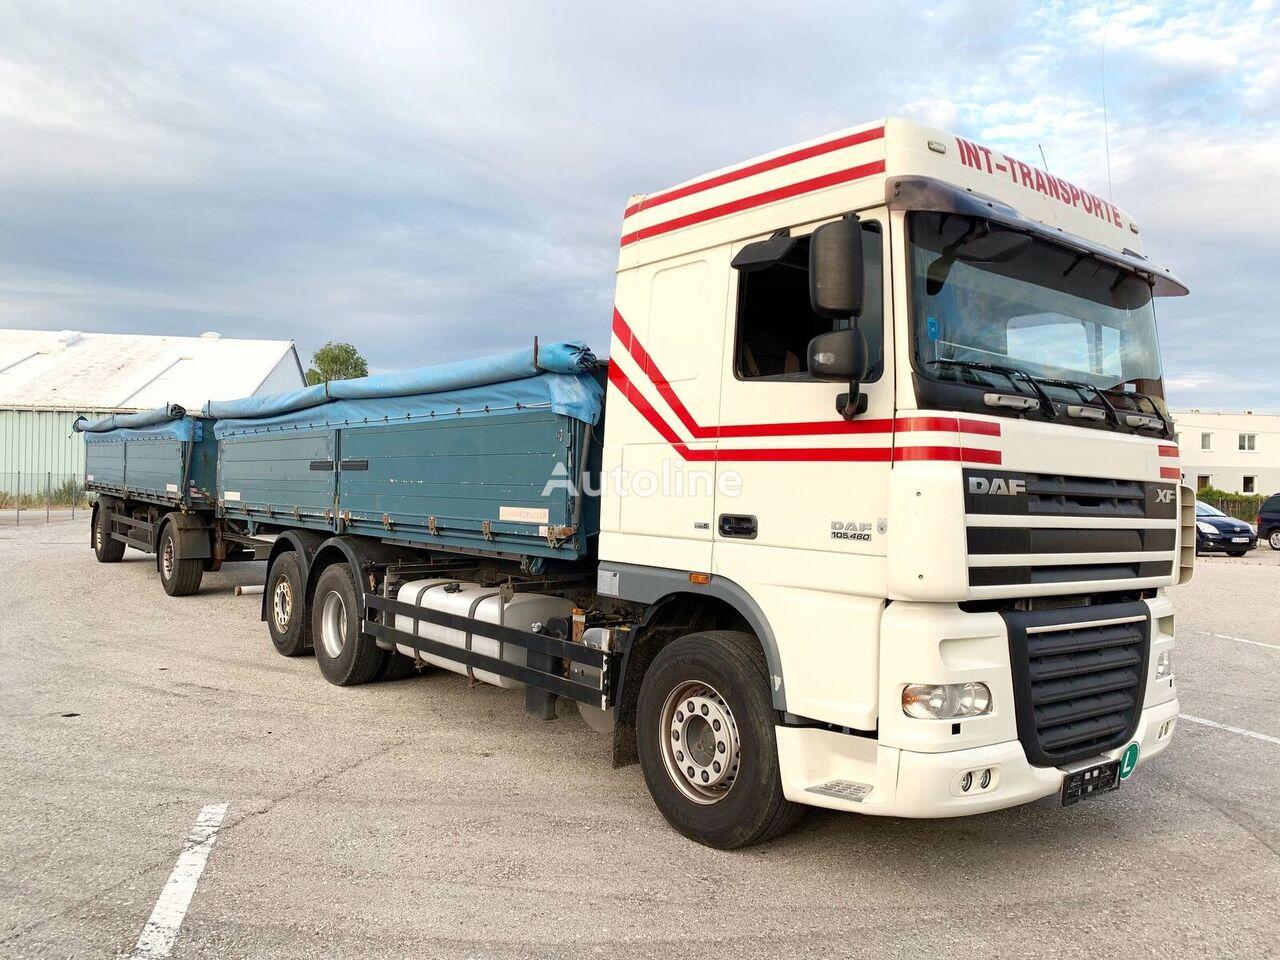 DAF XF105.460 3-Seiten GETREIDEKIPPER + 2 Achs Kipp-Anhänger kamion za prijevoz zrna + prikolica za prijevoz zrna